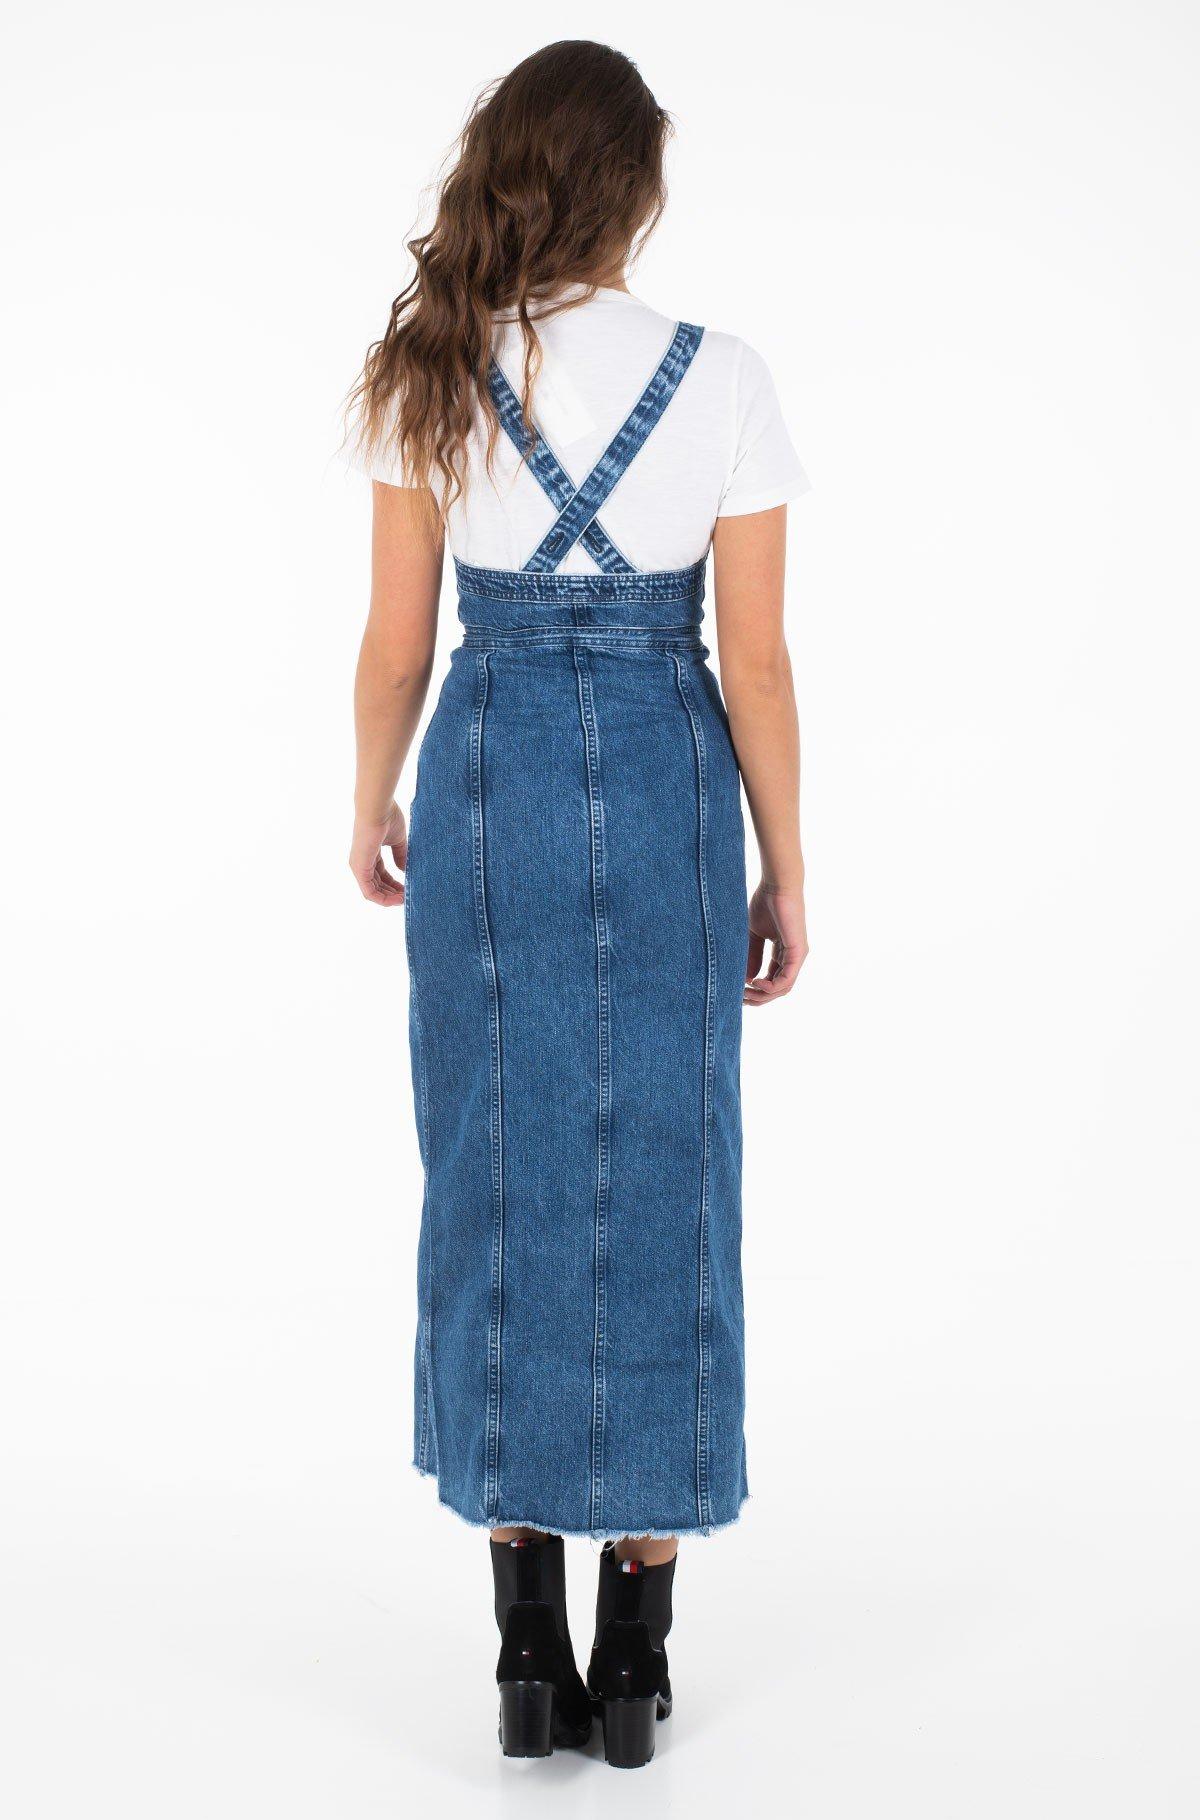 Denim dress LOTTIE/PL952614-full-2